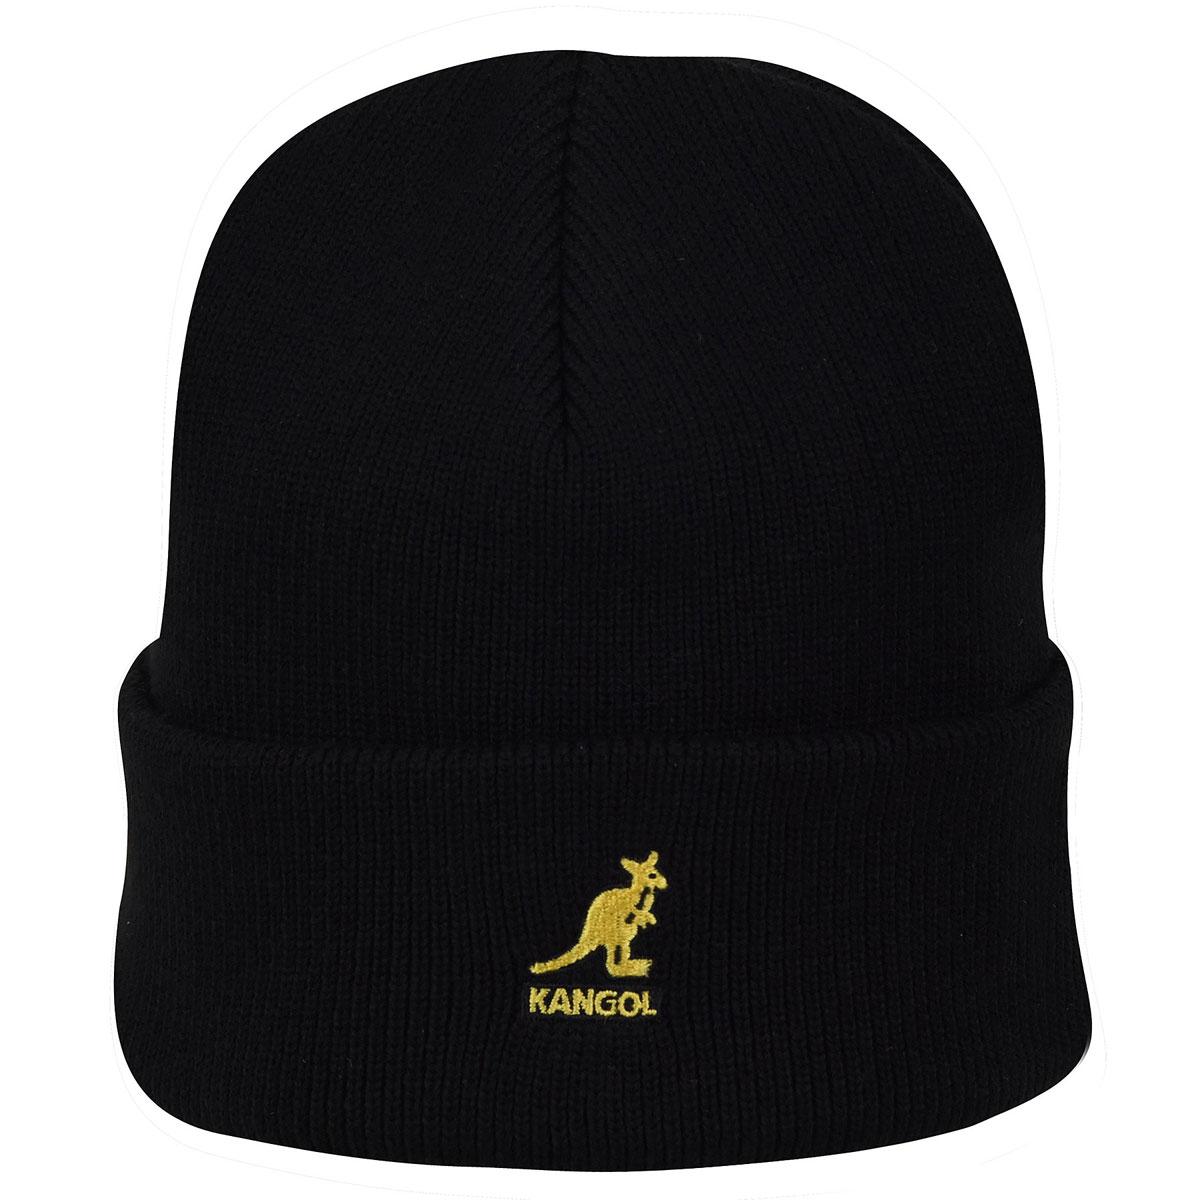 Kangol Acrylic Cuff Pull-On in Black,Gold